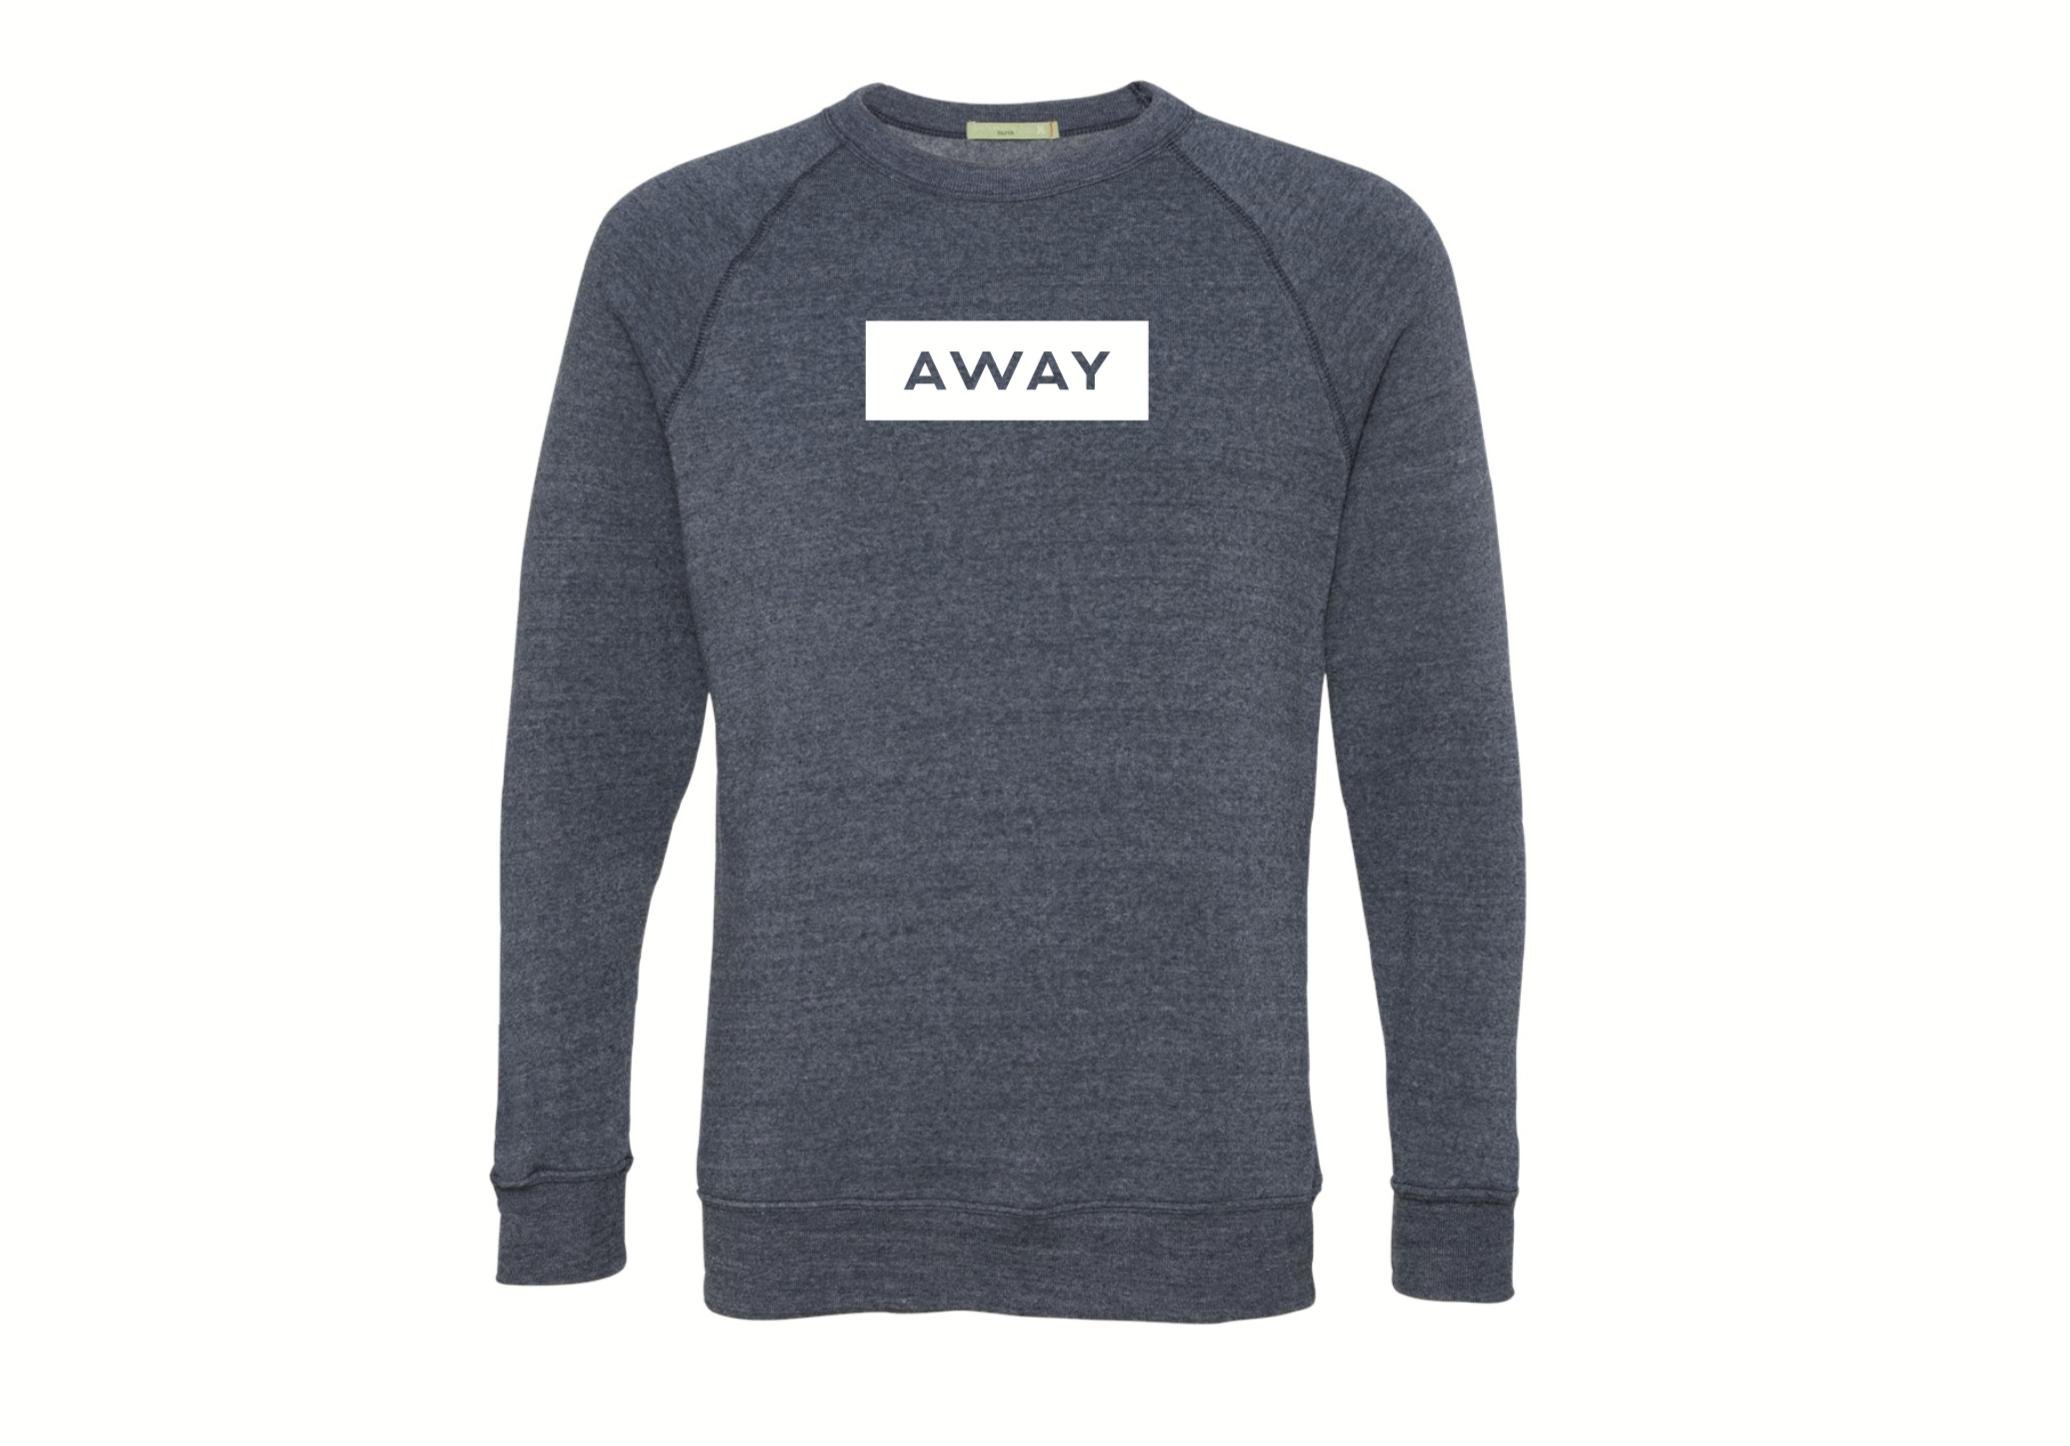 away_sweater_brand_apparel